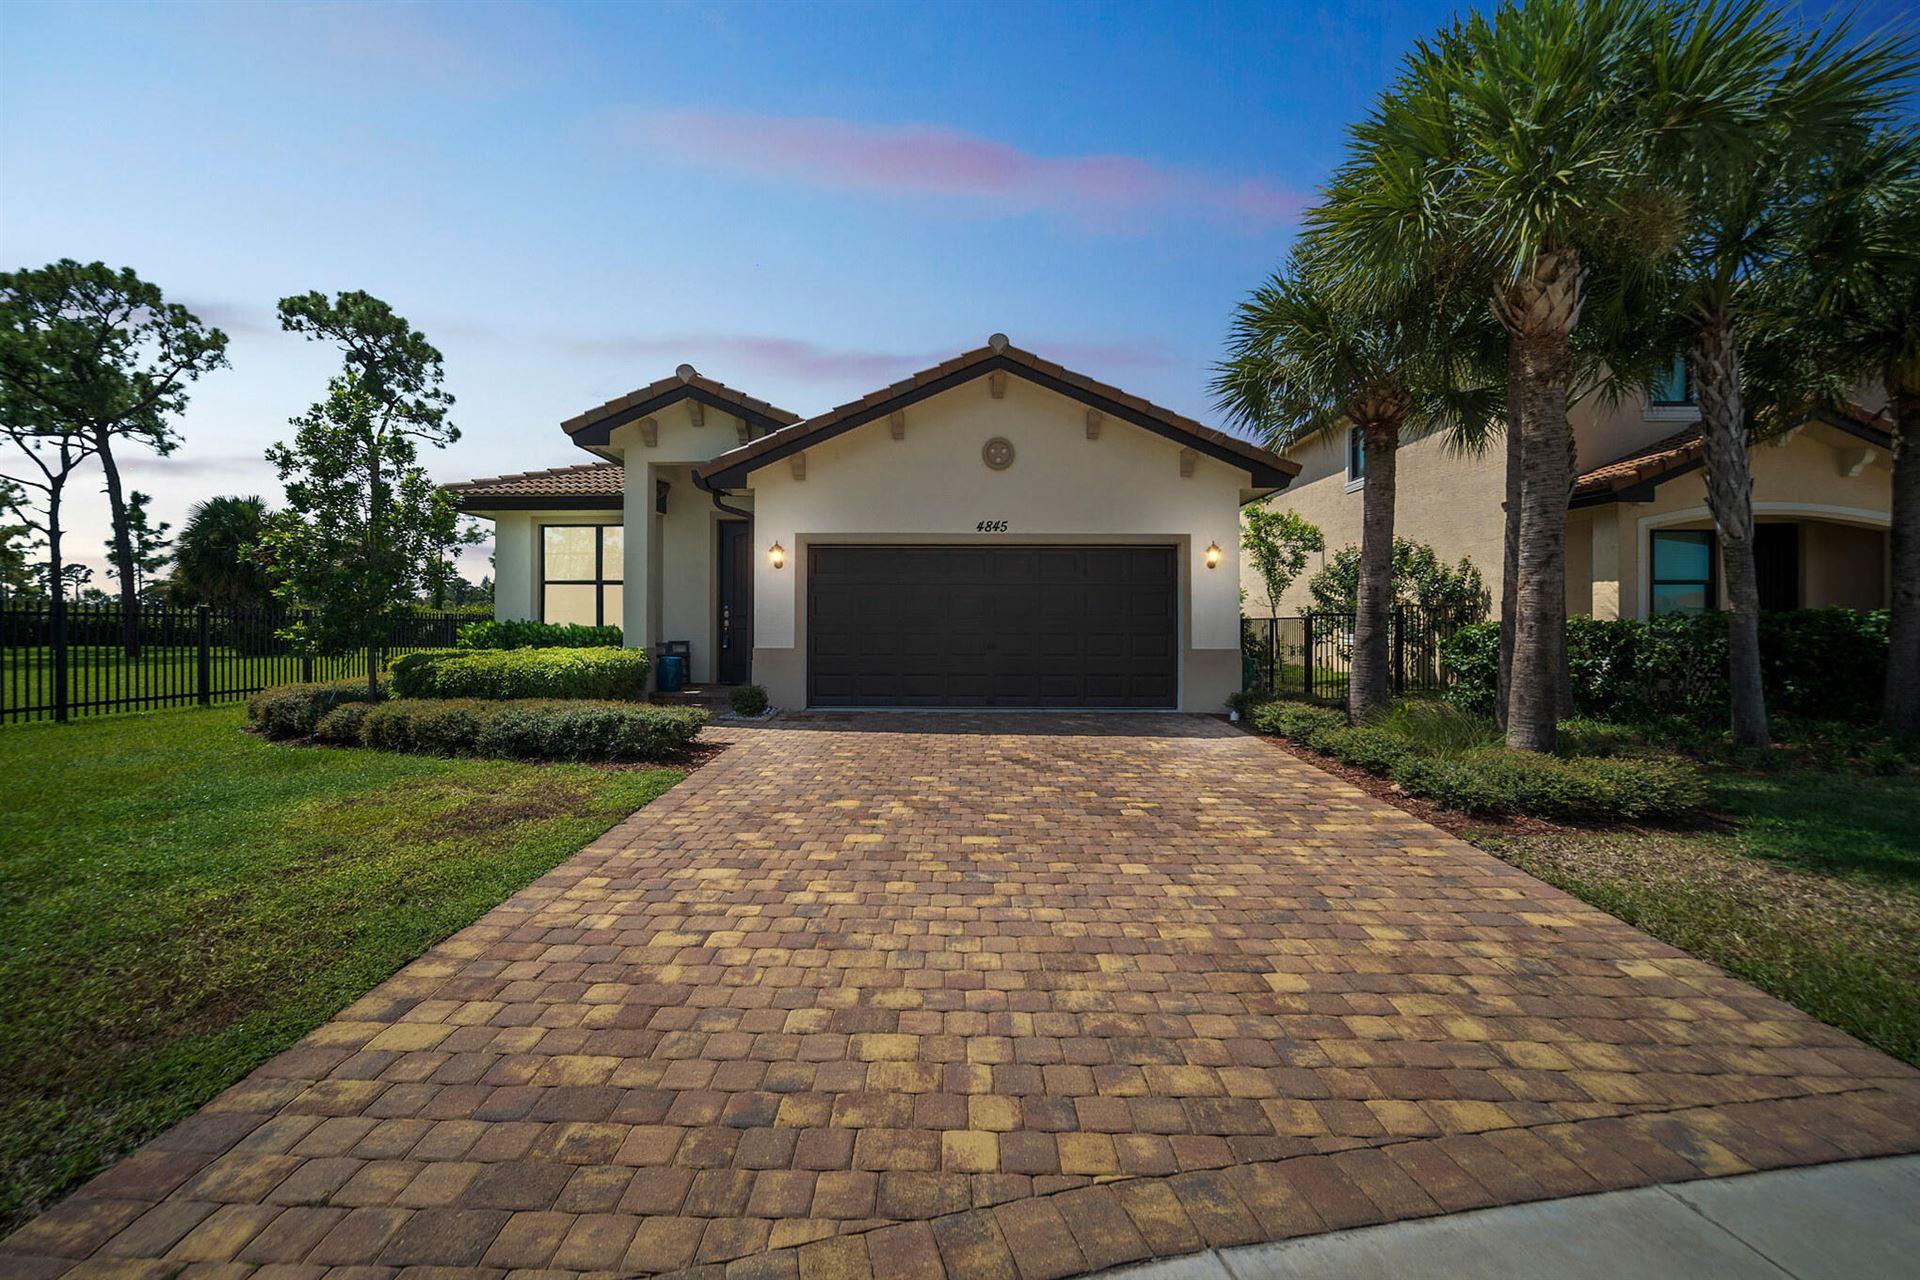 4845 Pond Pine Way, Greenacres, FL 33463 - MLS#: RX-10722267